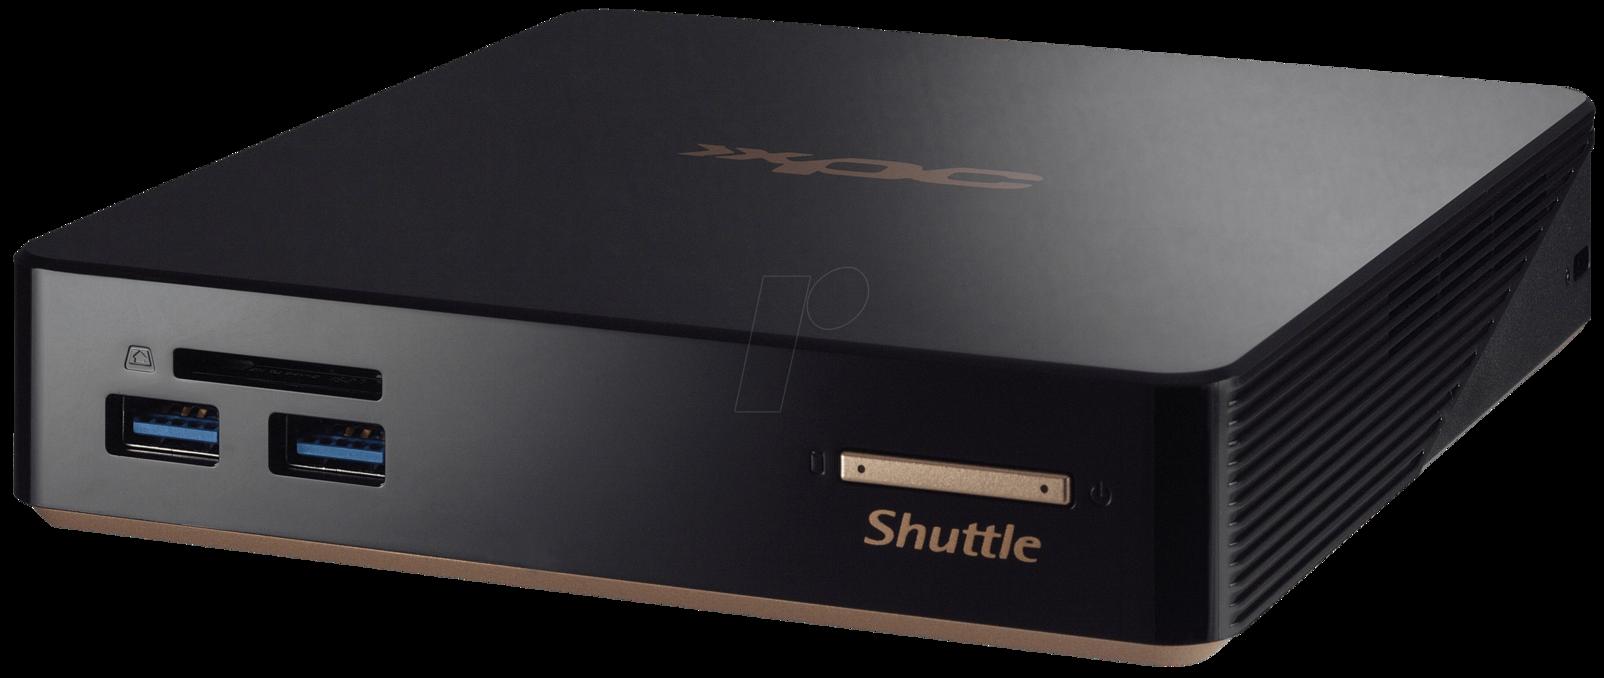 Shuttle Nano NC01U7 i7 5500U Mini Barebones System  $370 + Free S/H